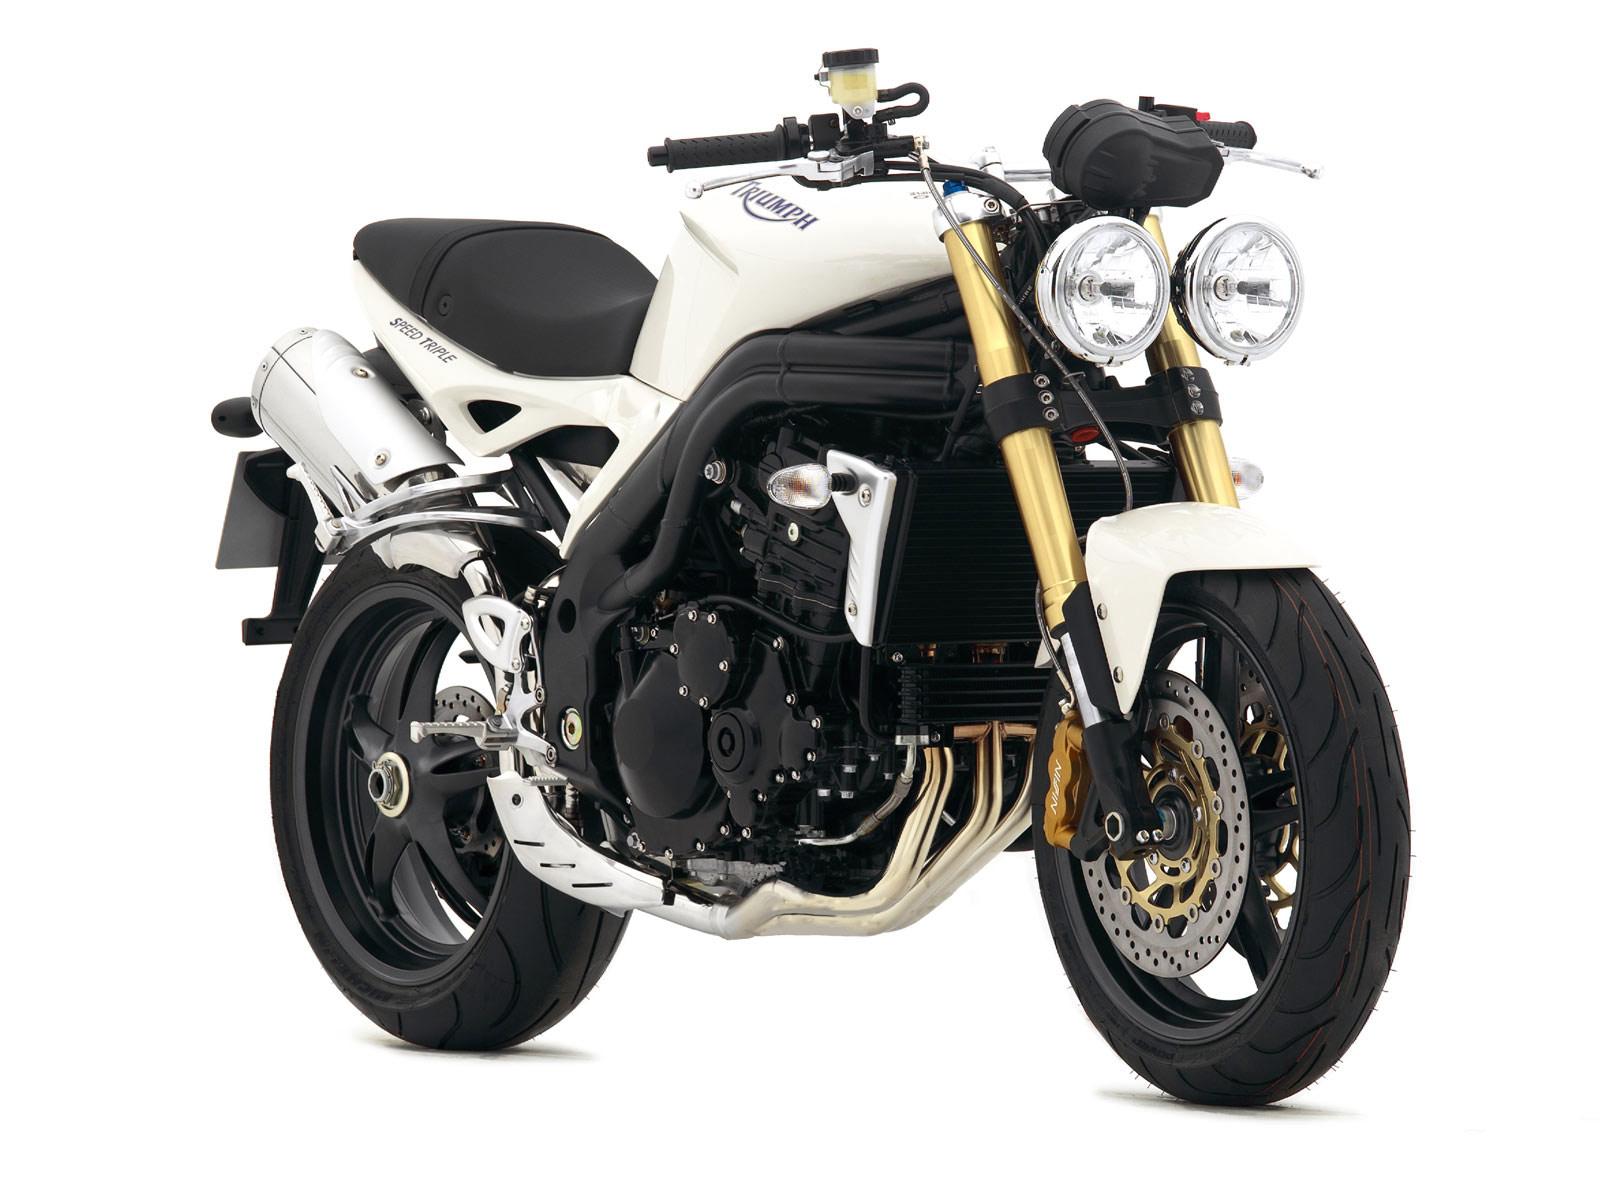 http://3.bp.blogspot.com/-OuQPYWGUrrE/Tq9qrB03GdI/AAAAAAAADXY/F9bqd9VHGXE/s1600/triumph_Speed_Triple_2007_motorcycle-desktop-wallpaper_1.jpg